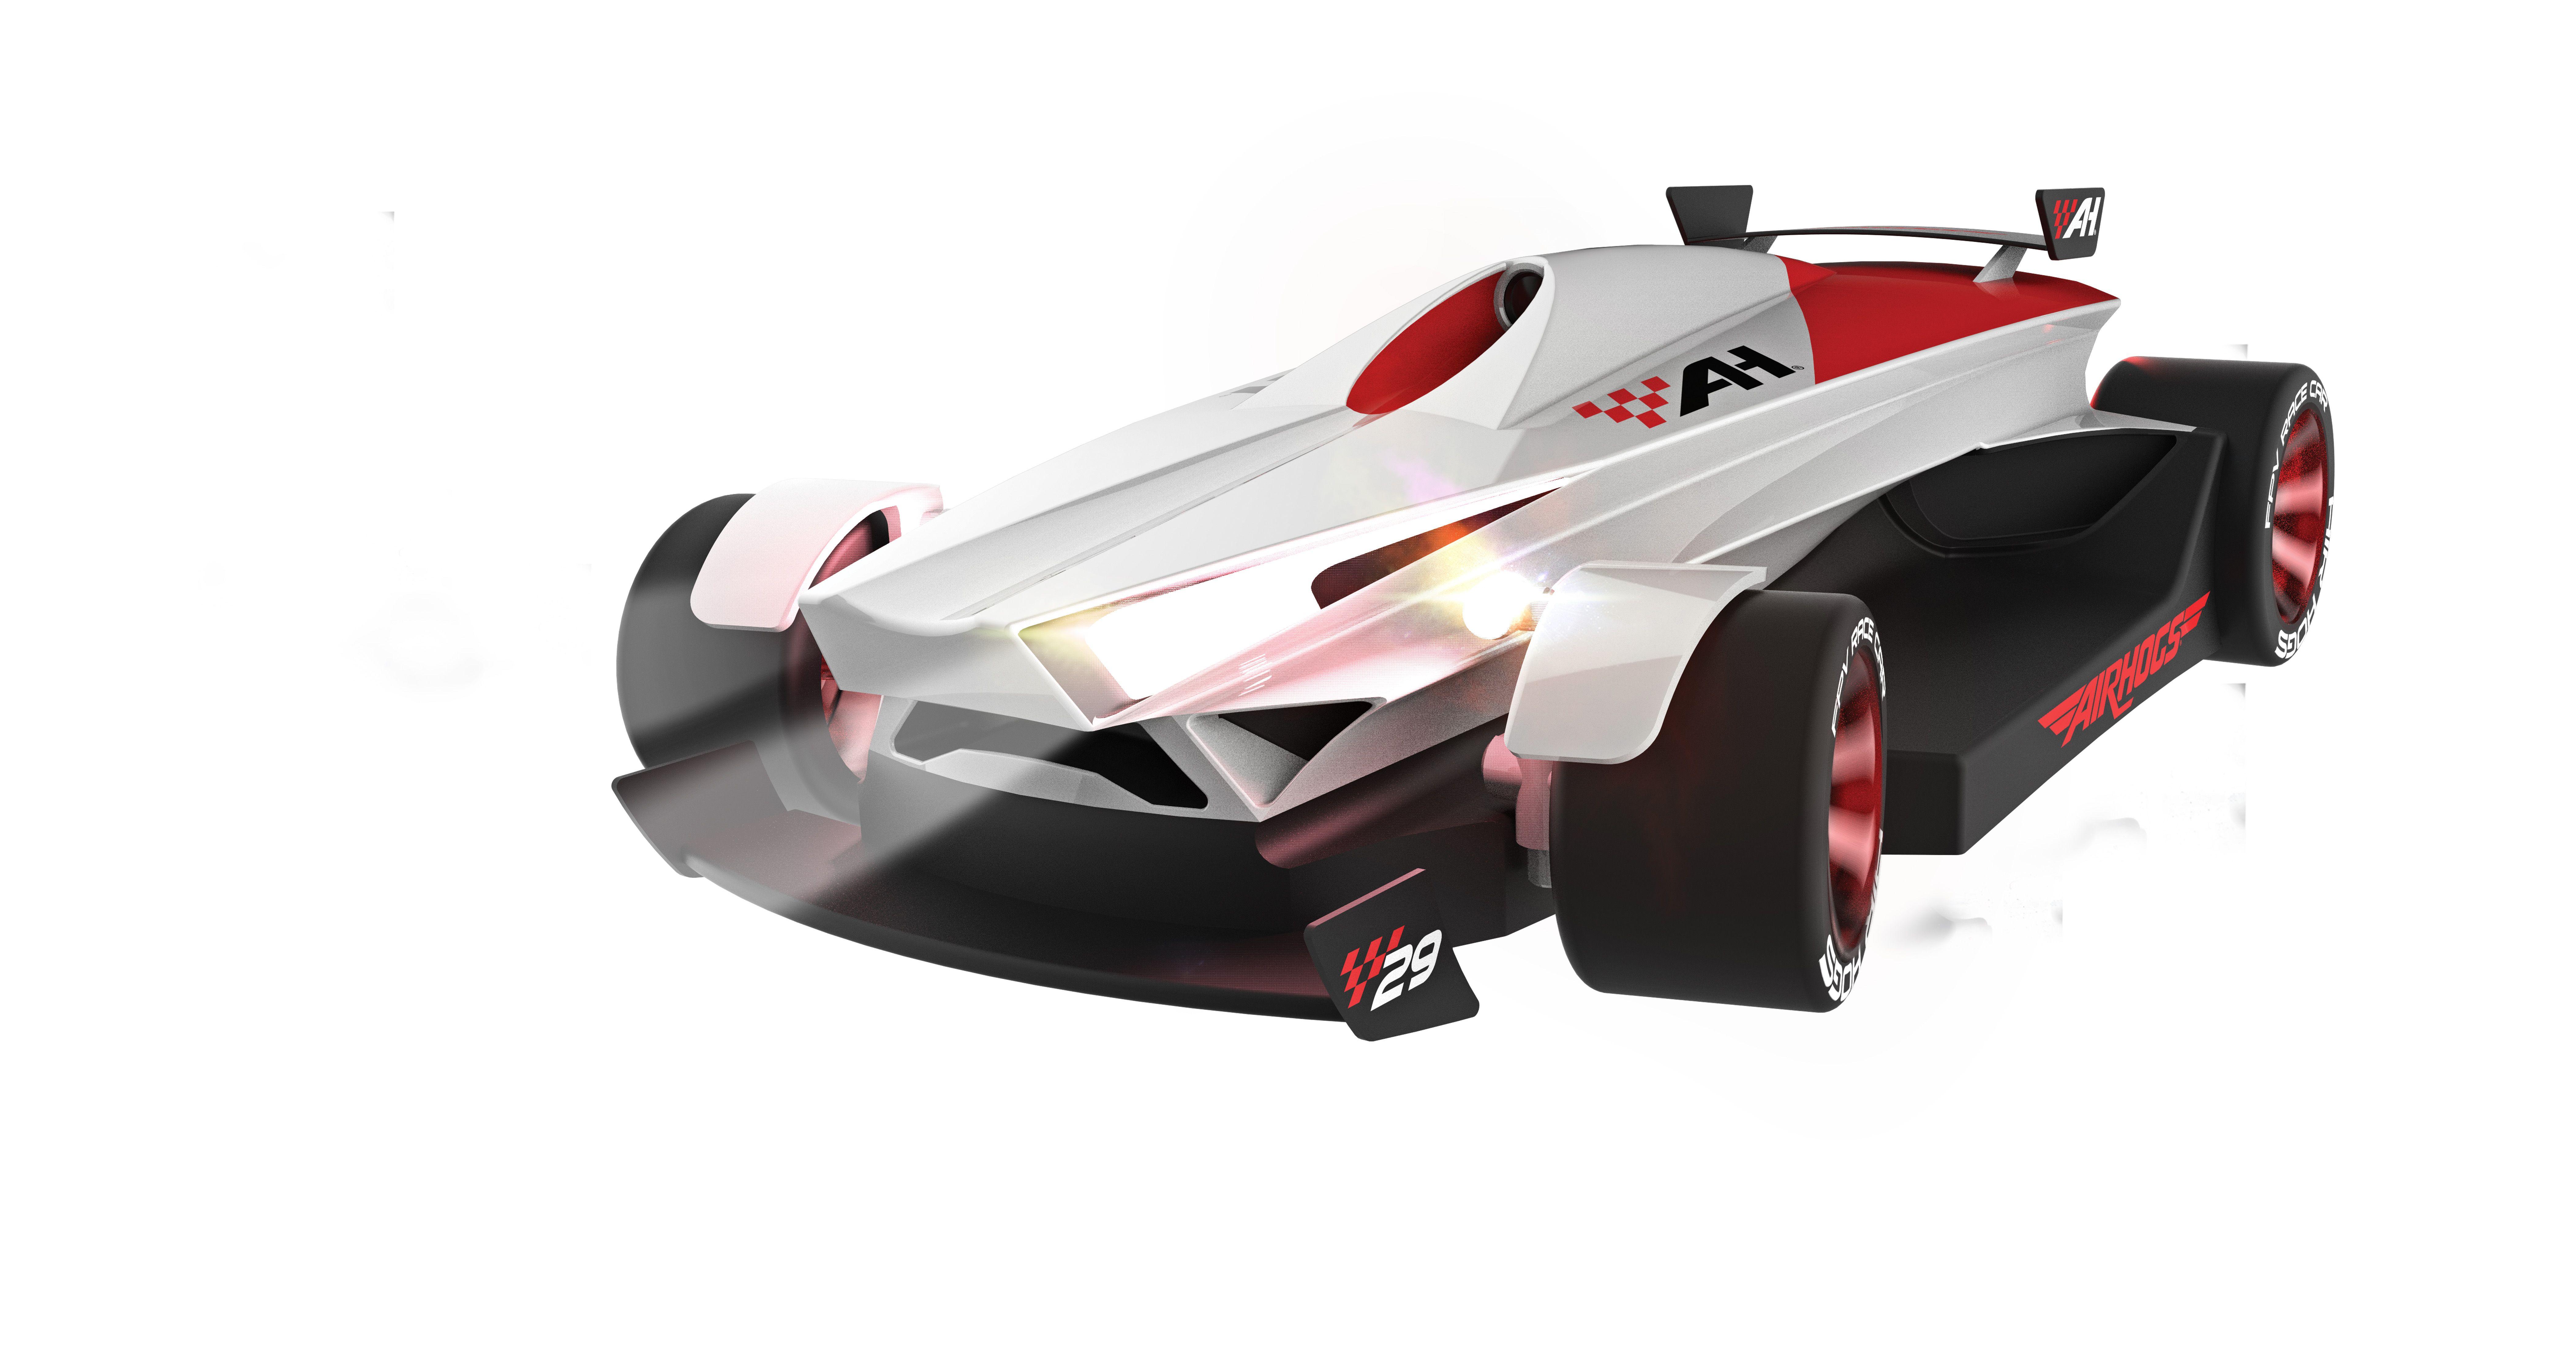 Air Hogs Fpv Race Car App Air Hogs Fpv High Speed Race Car Apps On